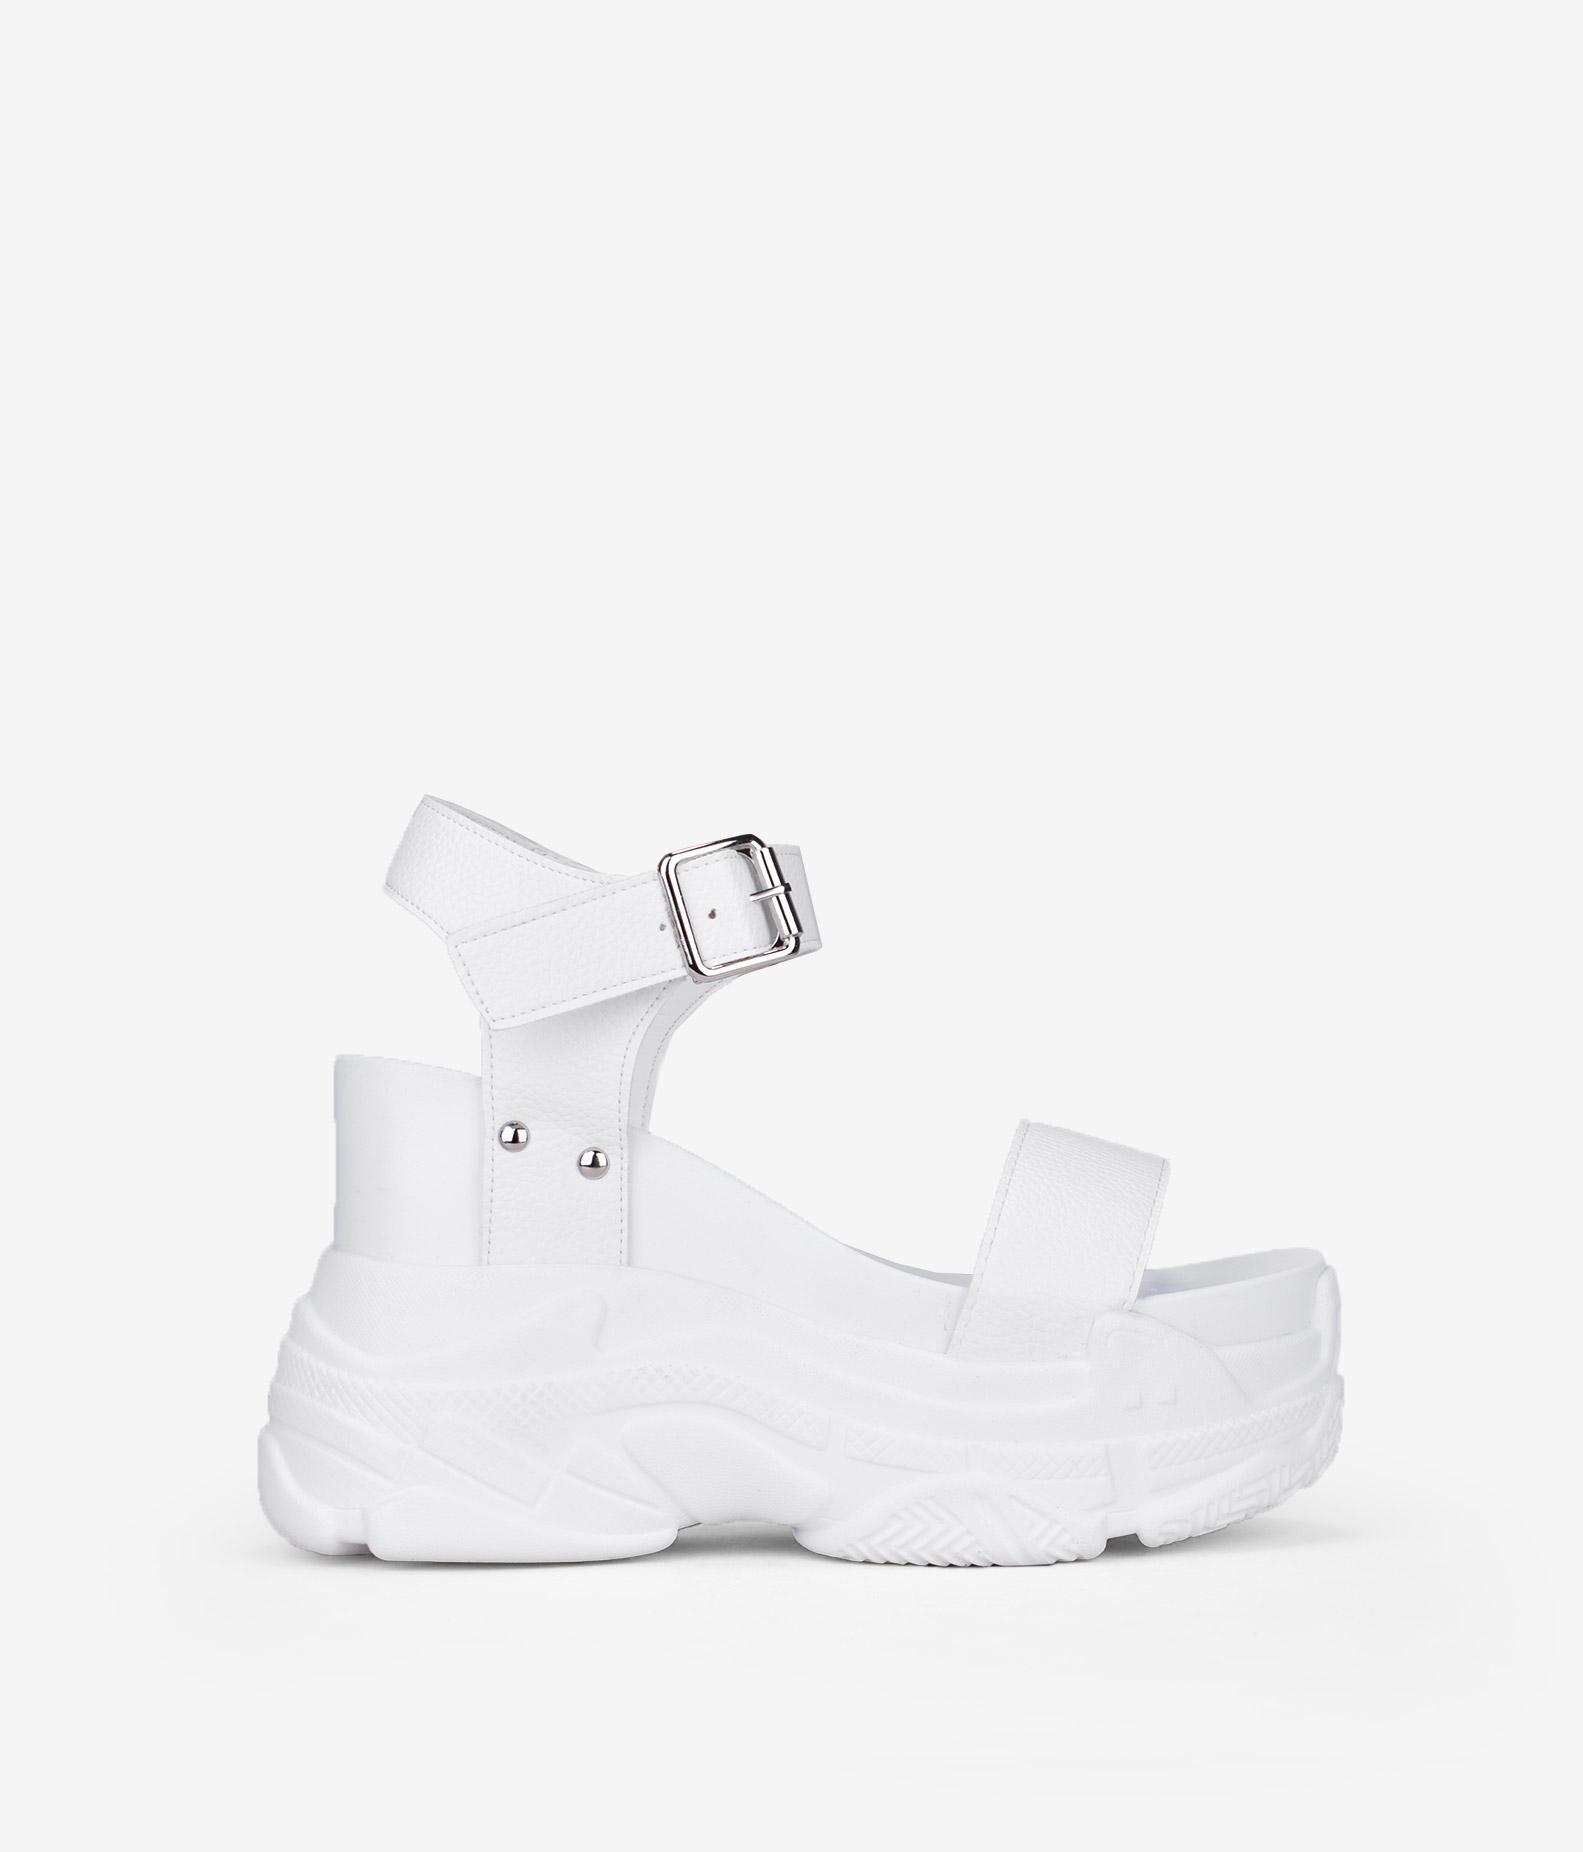 sandalia-deportiva-plataforma-blanca